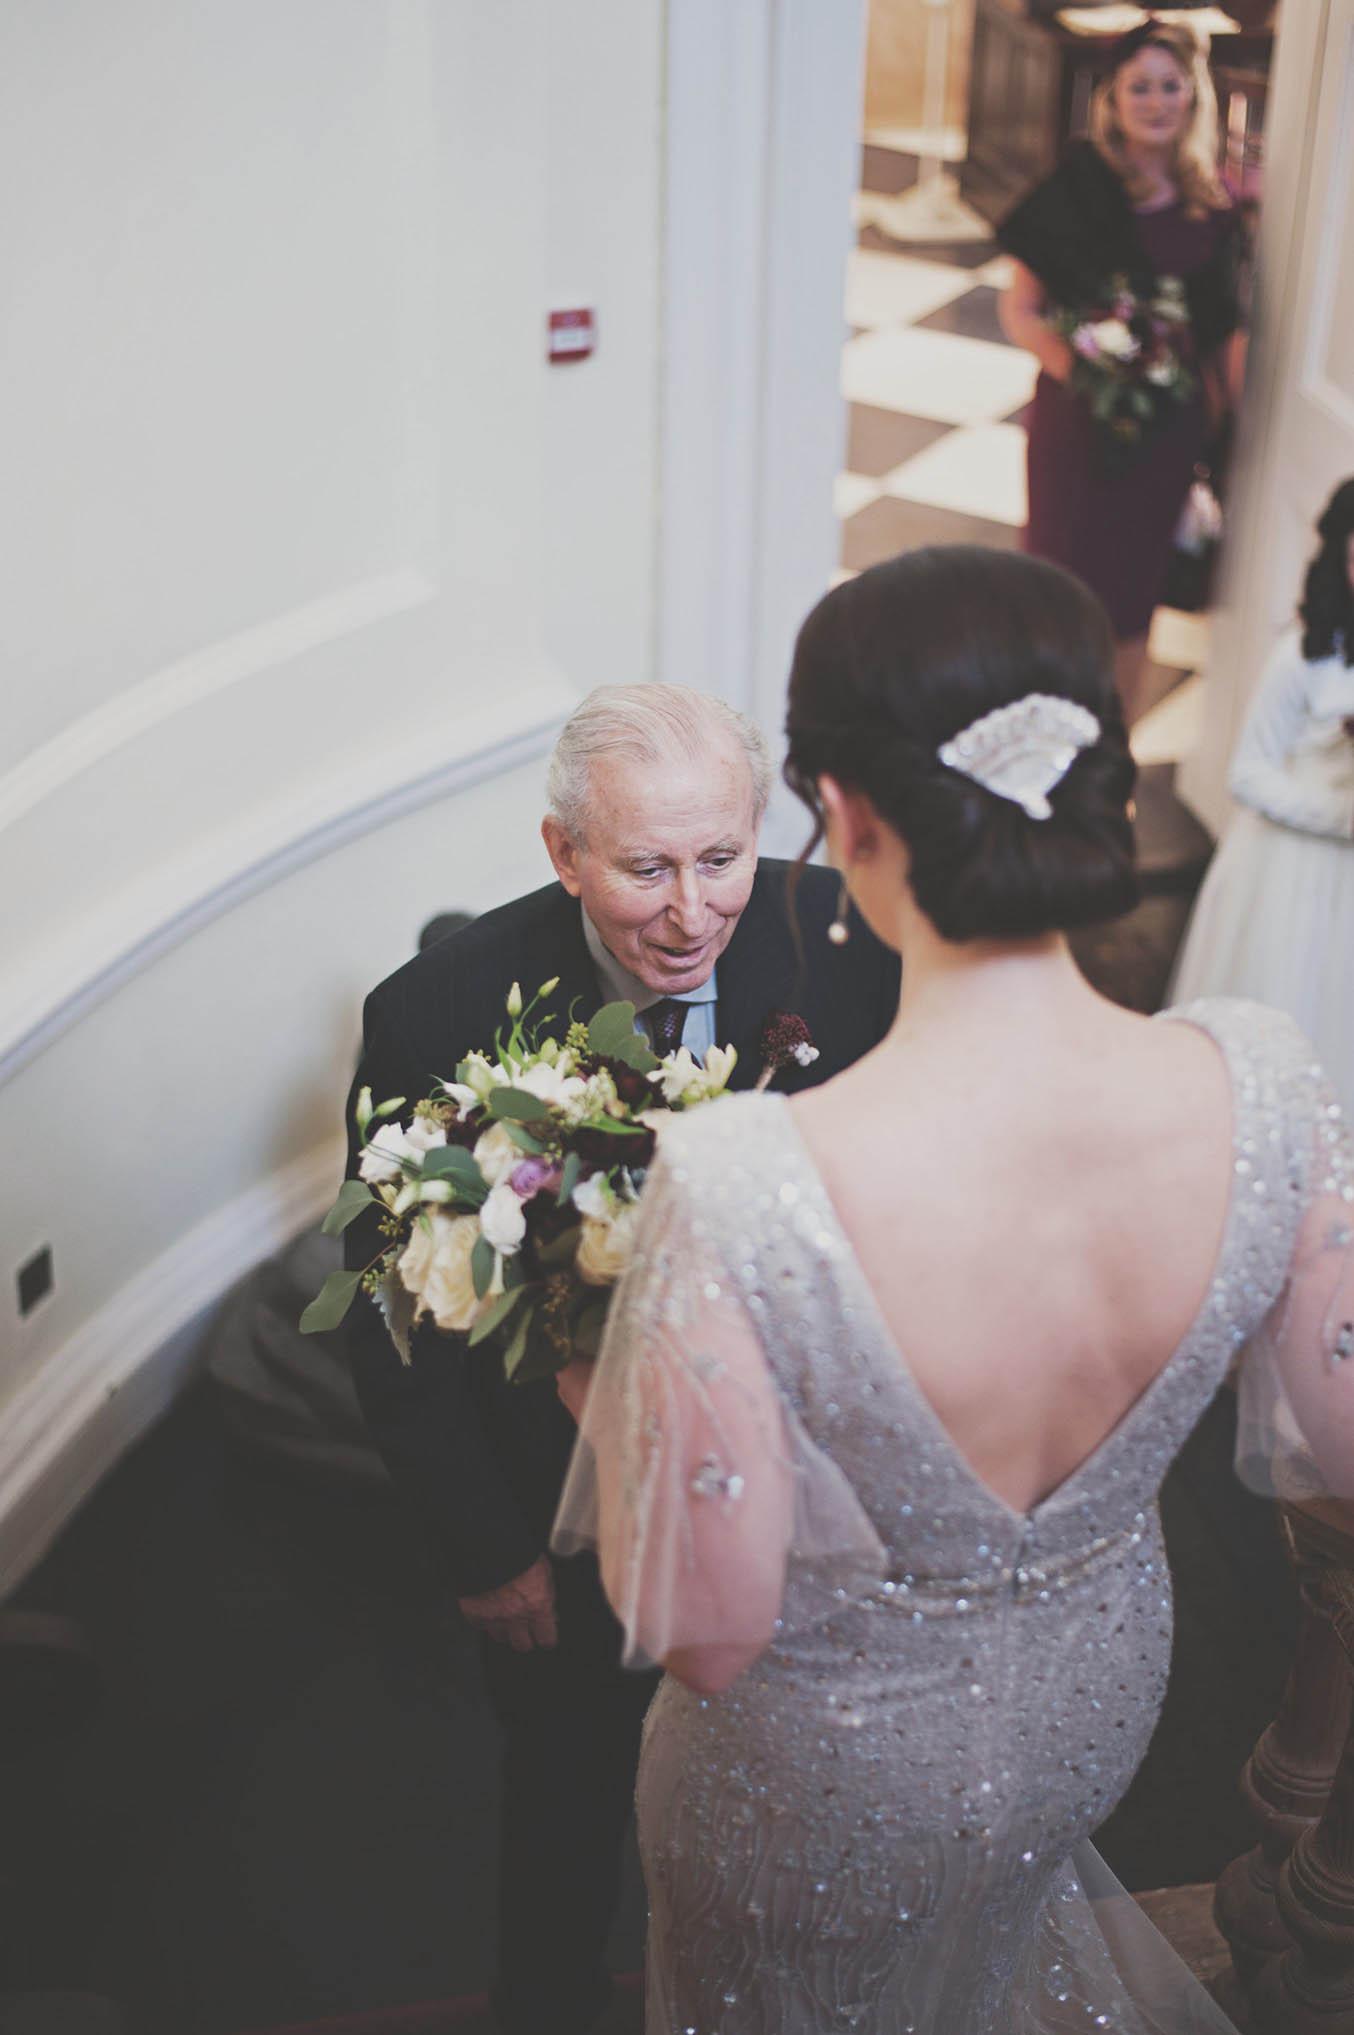 Bellinter House wedding, brides dress